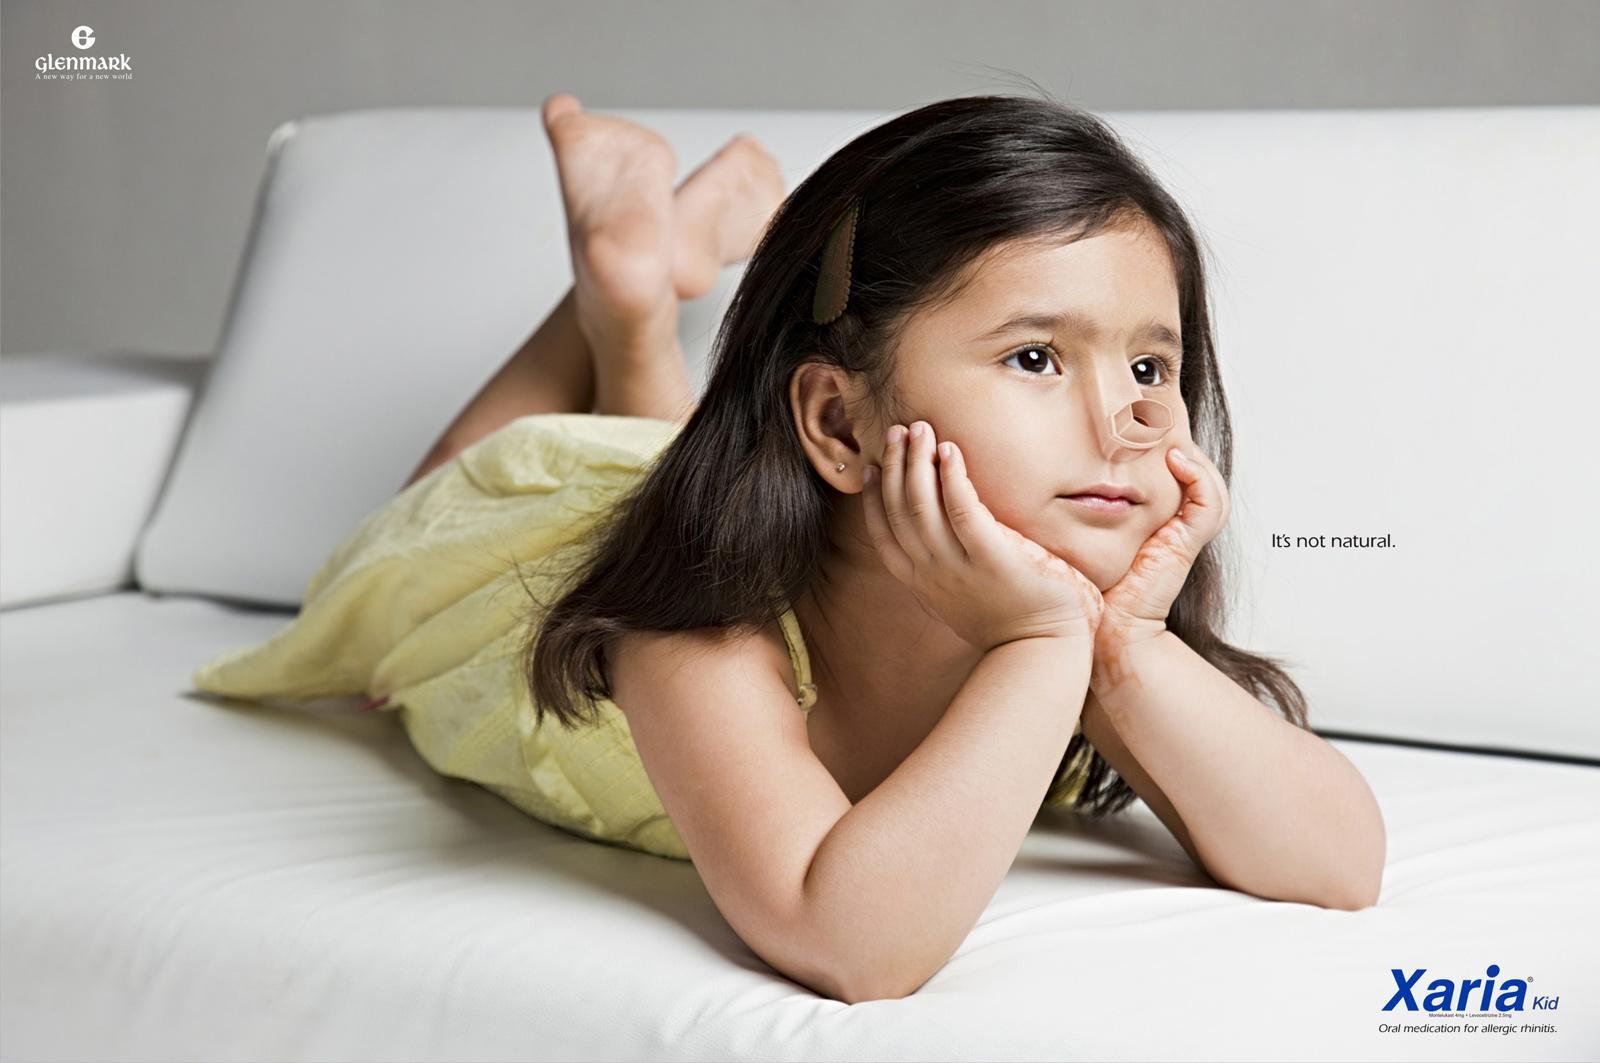 Xaria Kid Print Ad -  It's not natural, 1